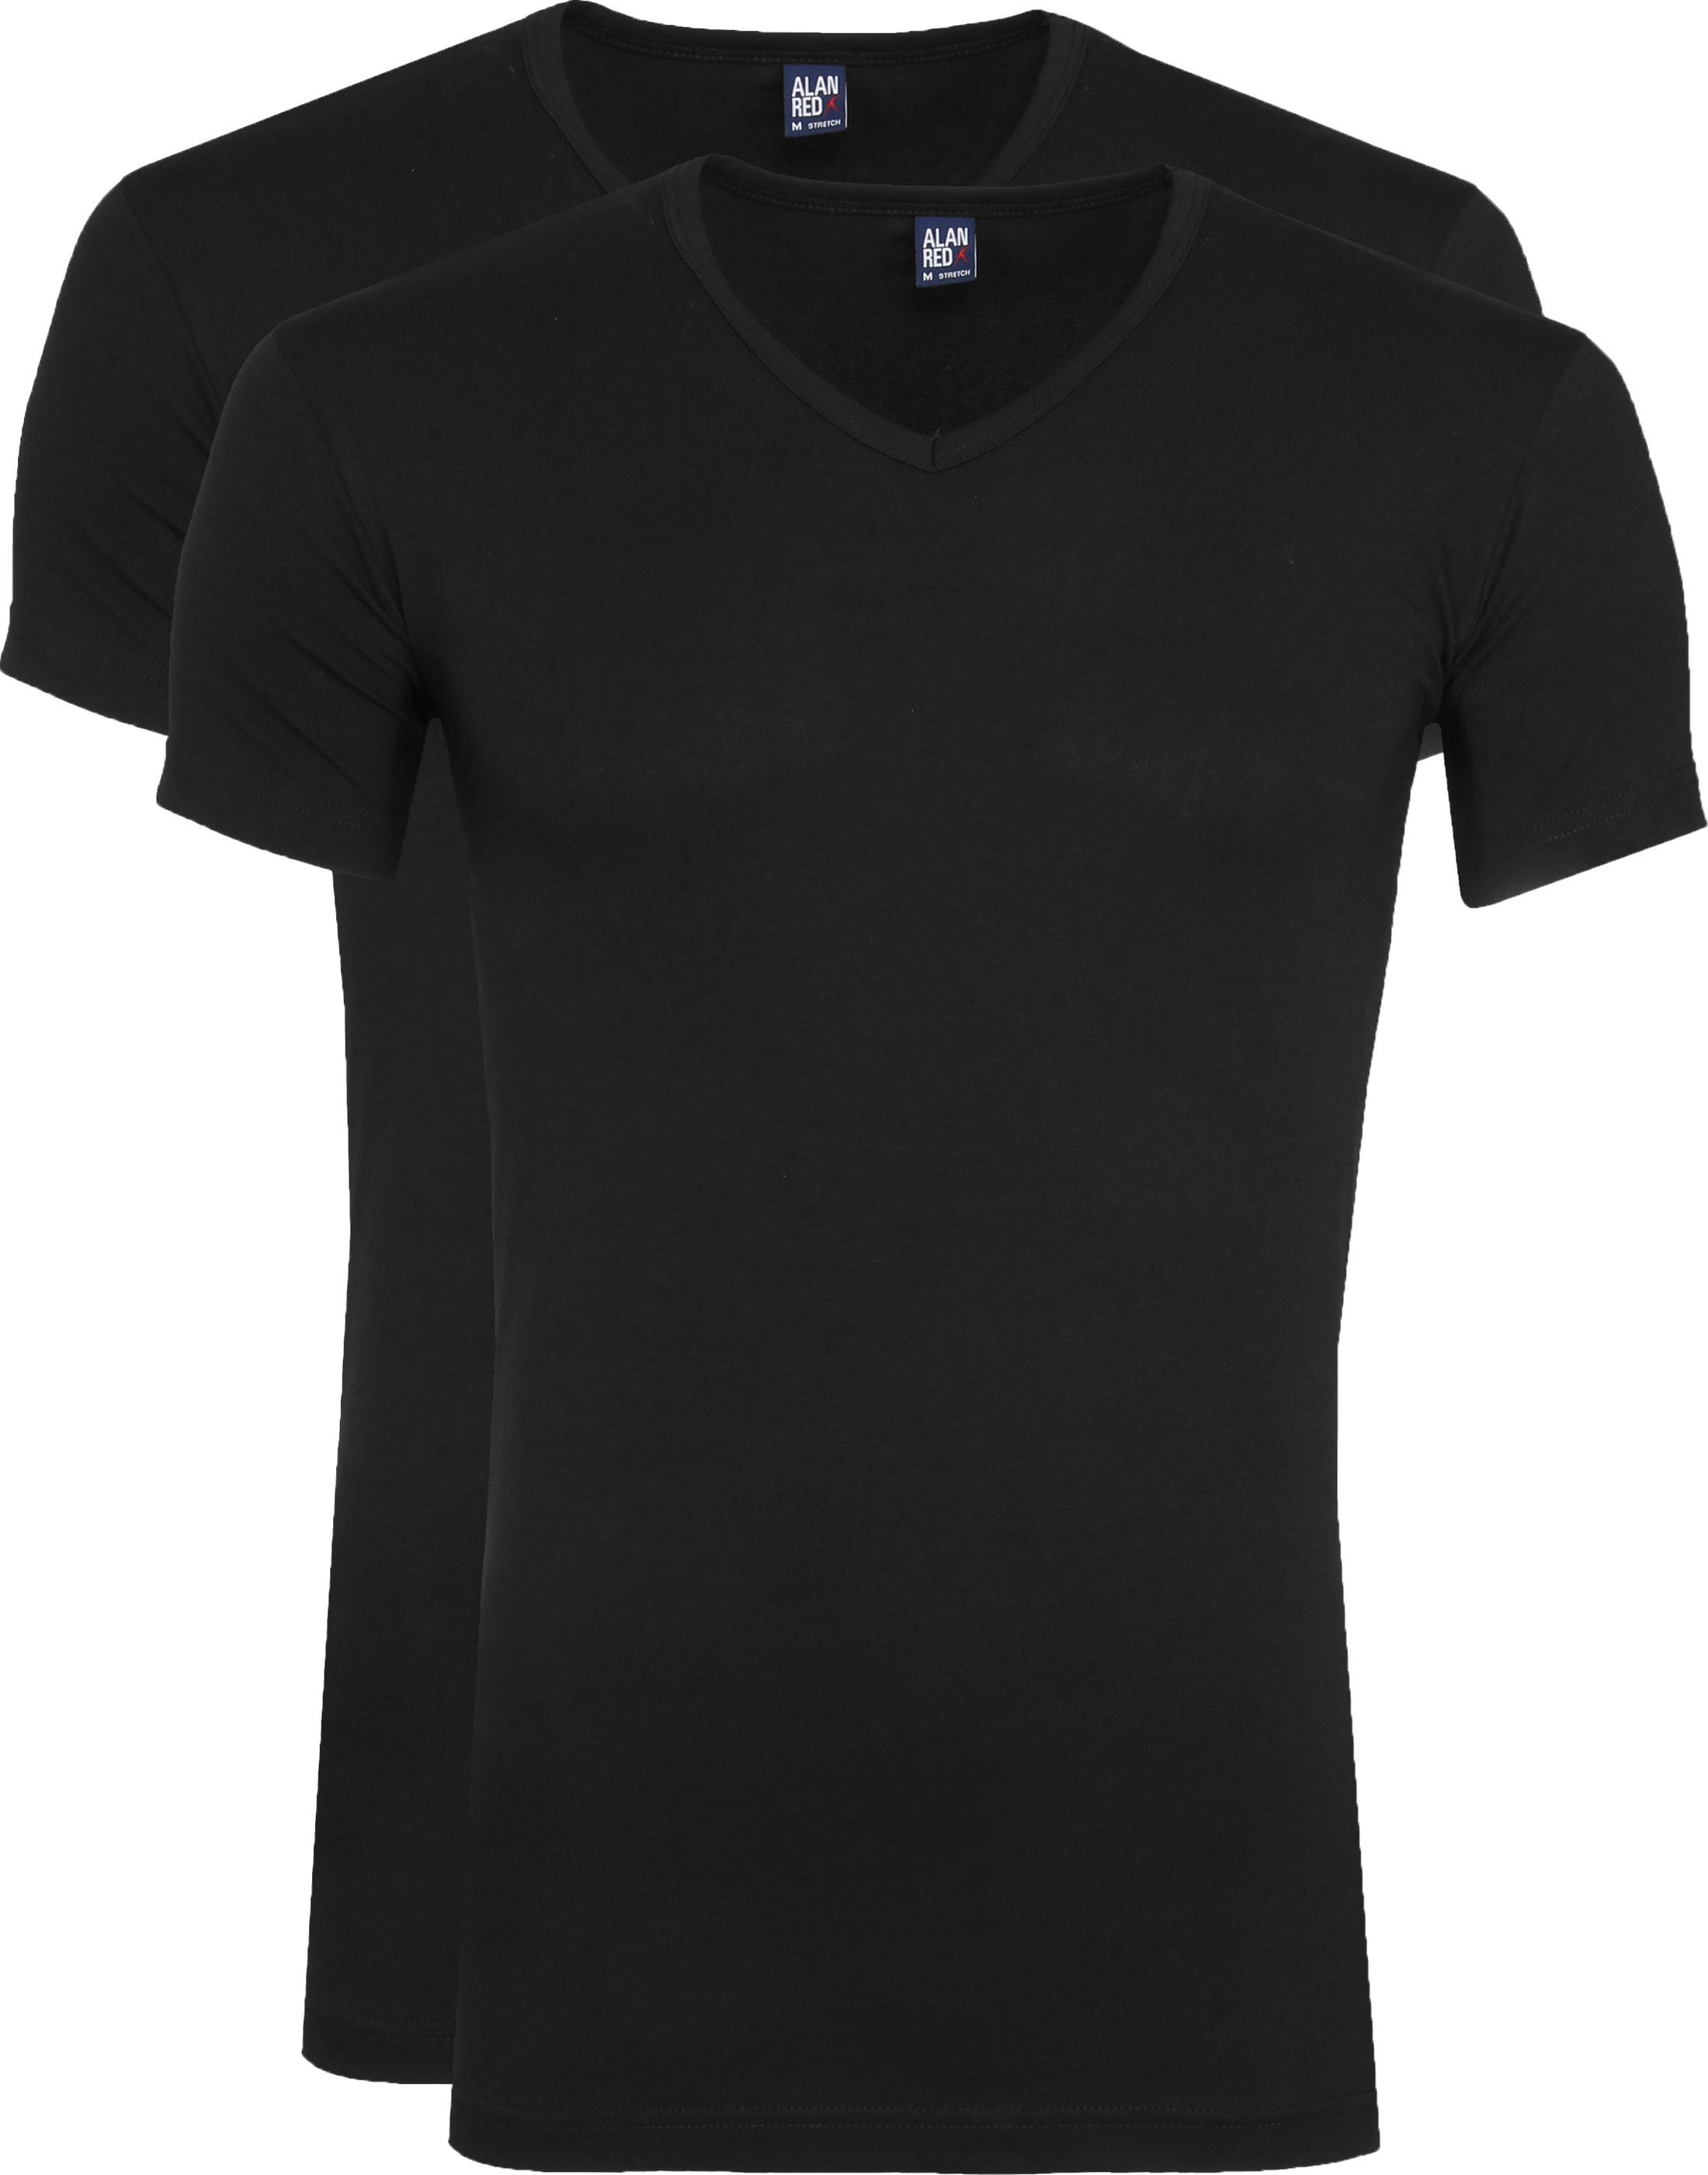 Alan Red Oklahoma Stretch T-Shirt Schwarz (2er-Pack) Foto 0